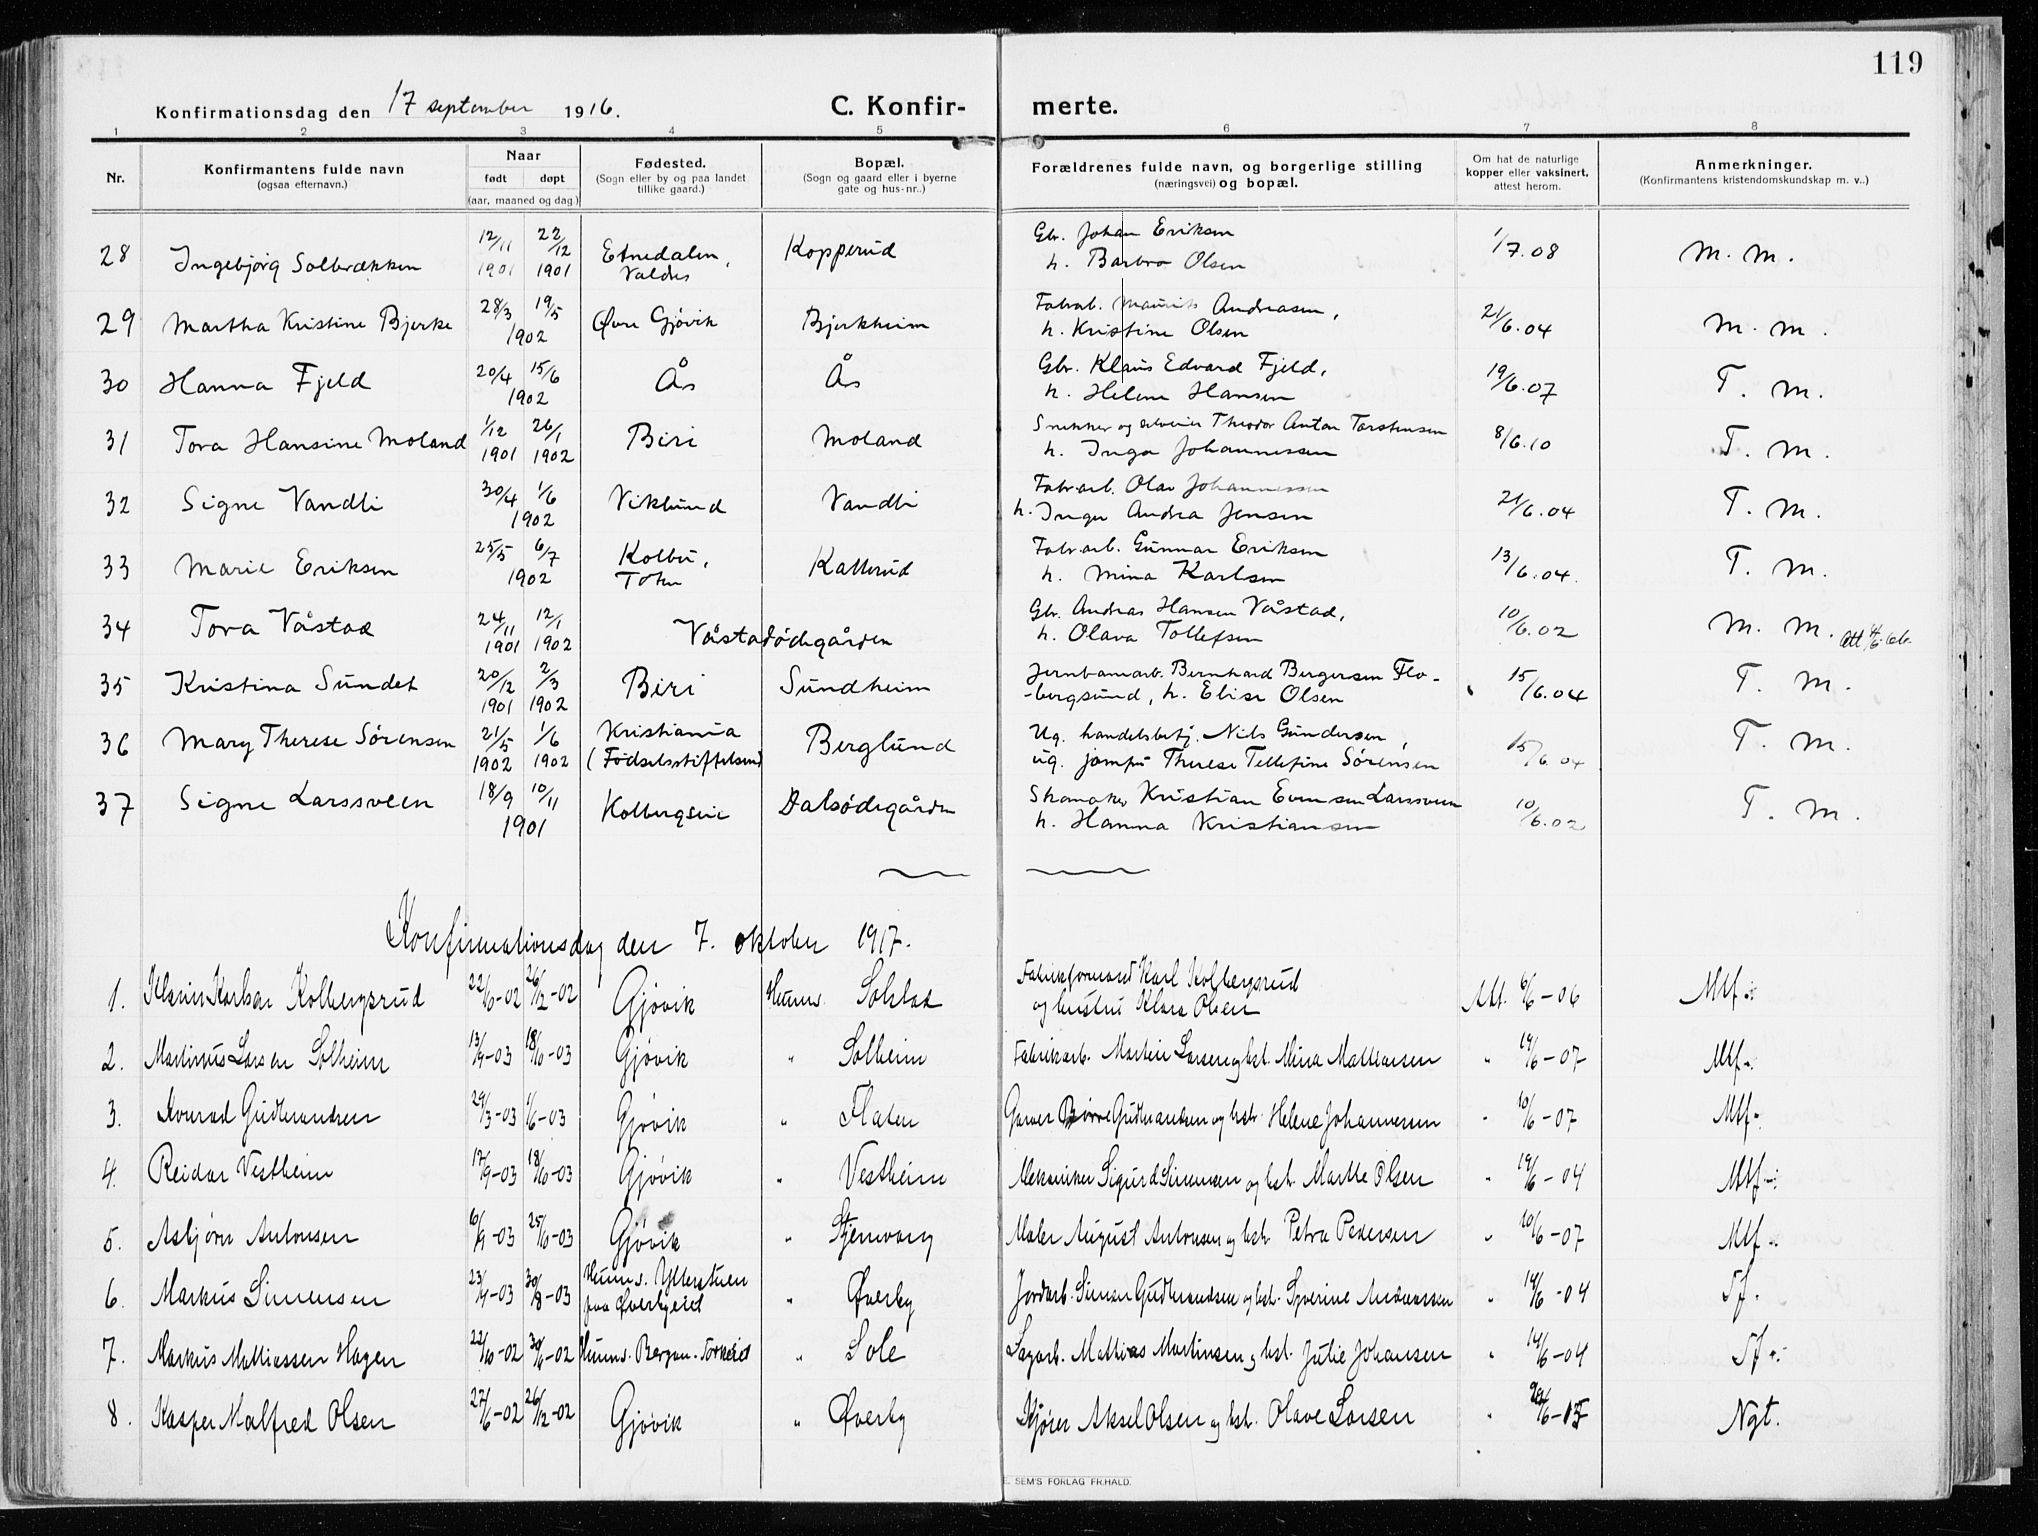 SAH, Vardal prestekontor, H/Ha/Haa/L0017: Ministerialbok nr. 17, 1915-1929, s. 119